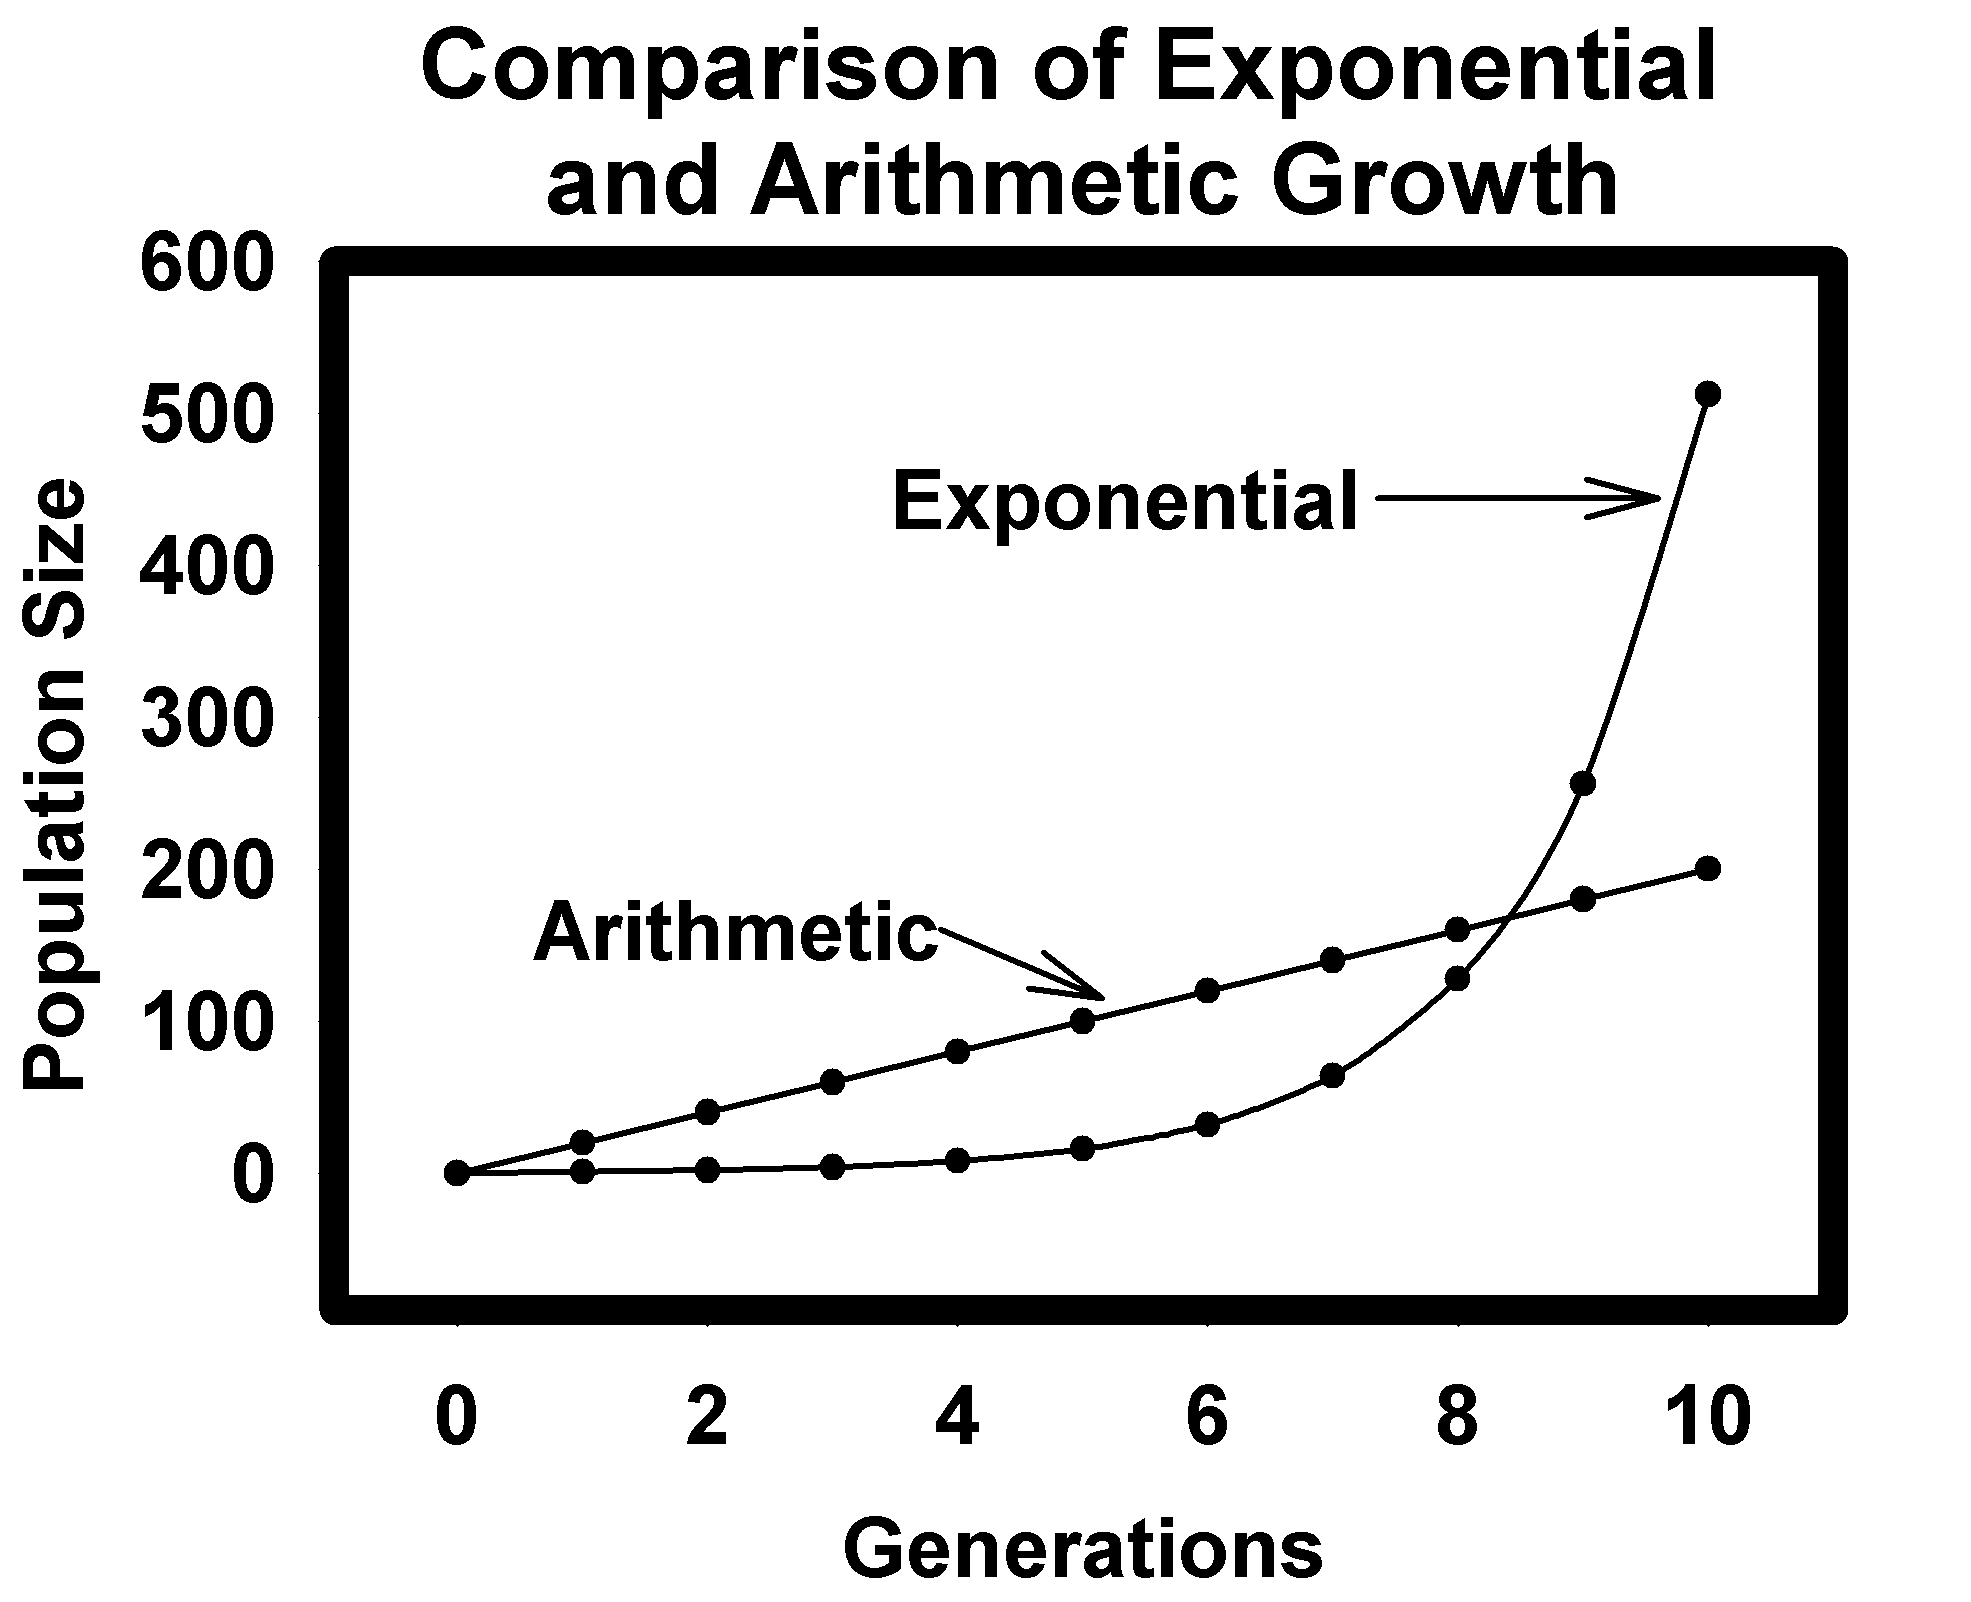 003 Malthusgrowthcurves Jpg Essay Example Thomas Malthus On The Principle Of Stupendous Population After Reading Malthus's Principles Darwin Got Idea That Ap Euro Full